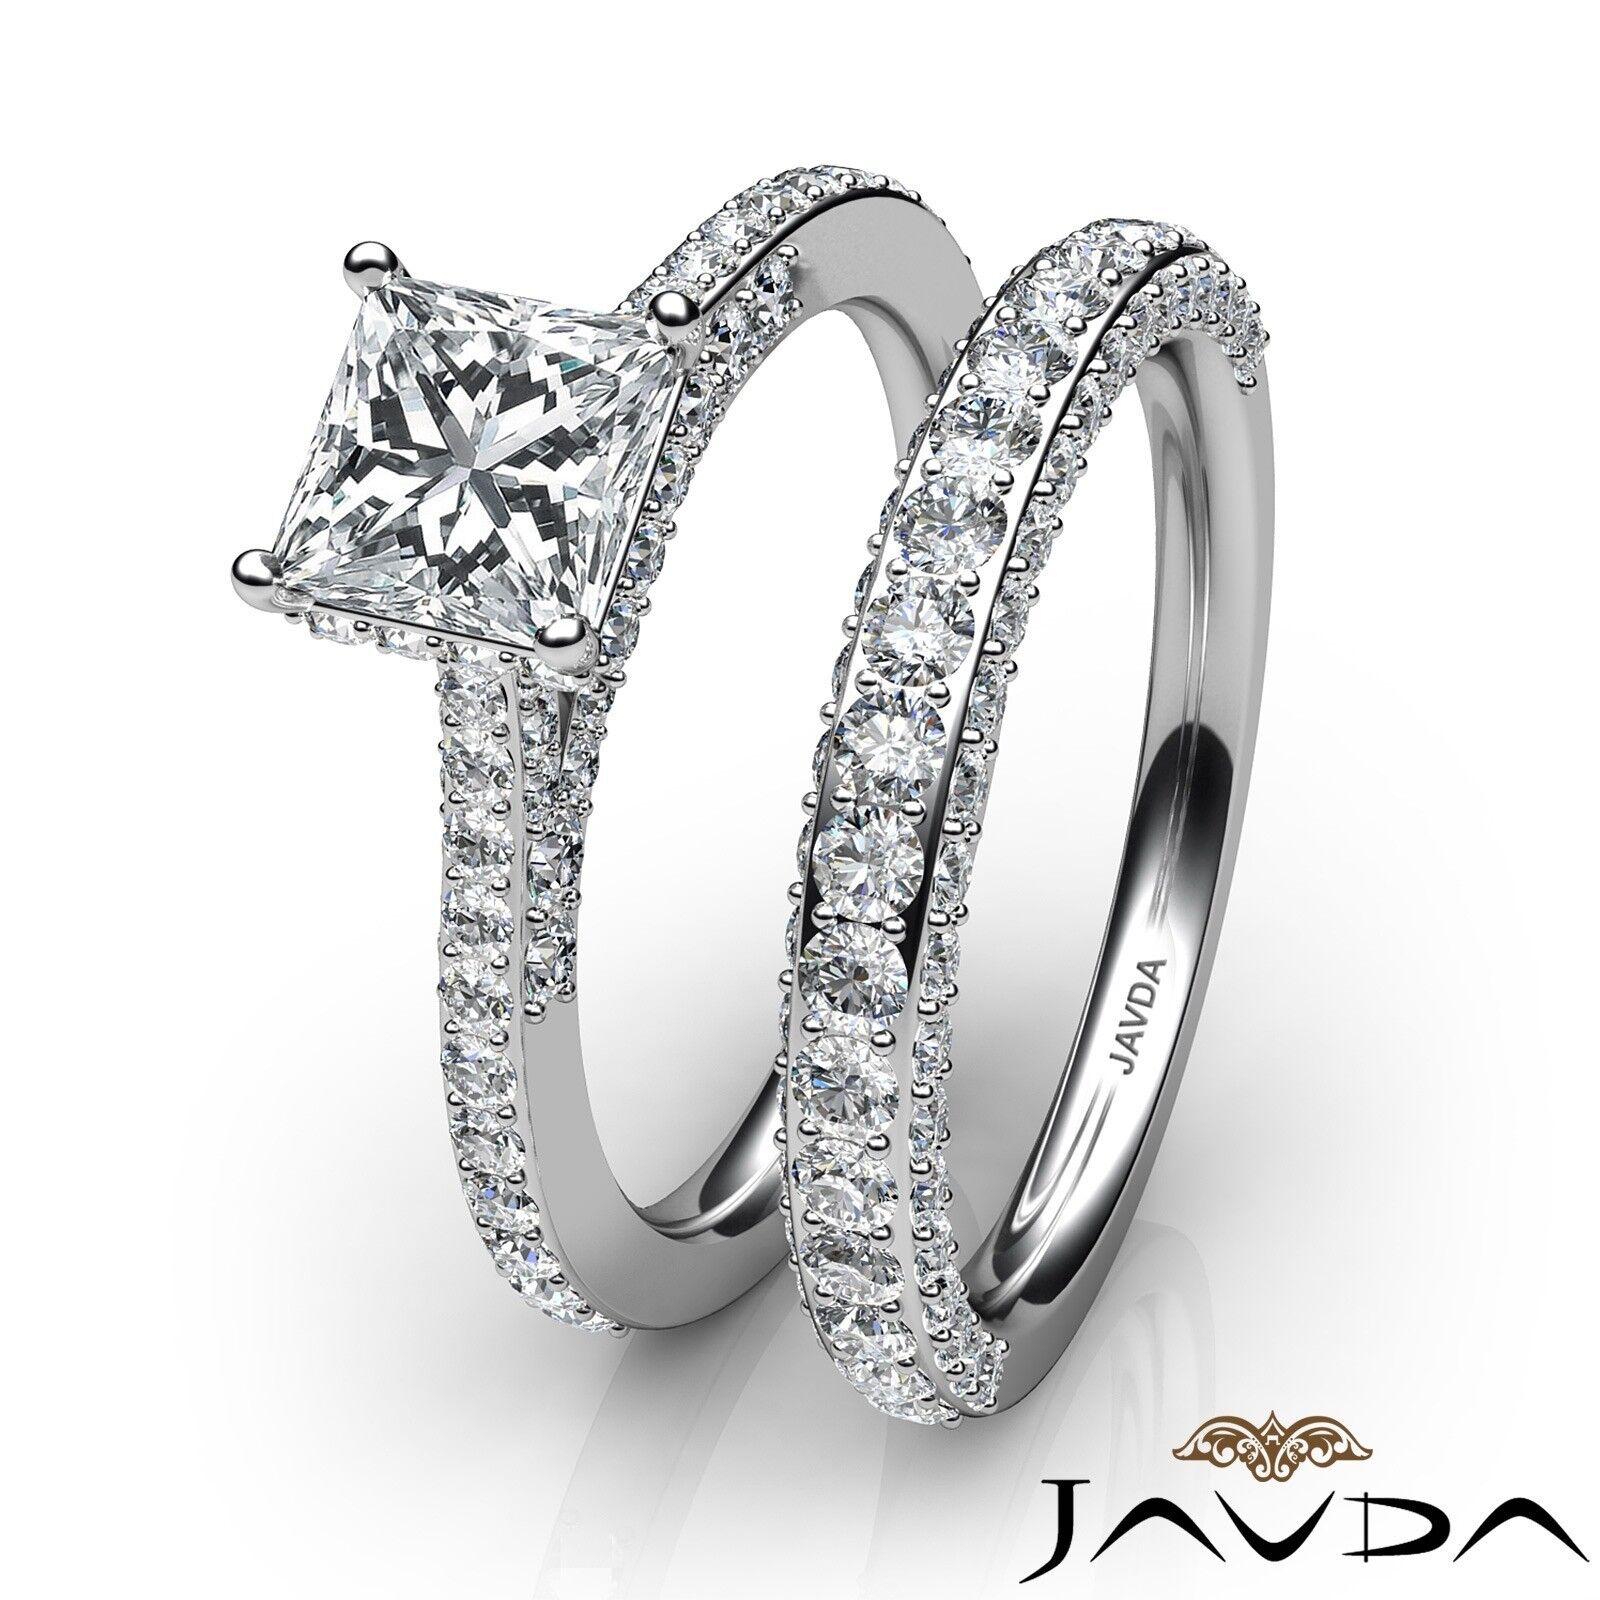 2.35ctw Circa Halo Pave Wedding Set Princess Diamond Engagement Ring GIA G-VVS1 3